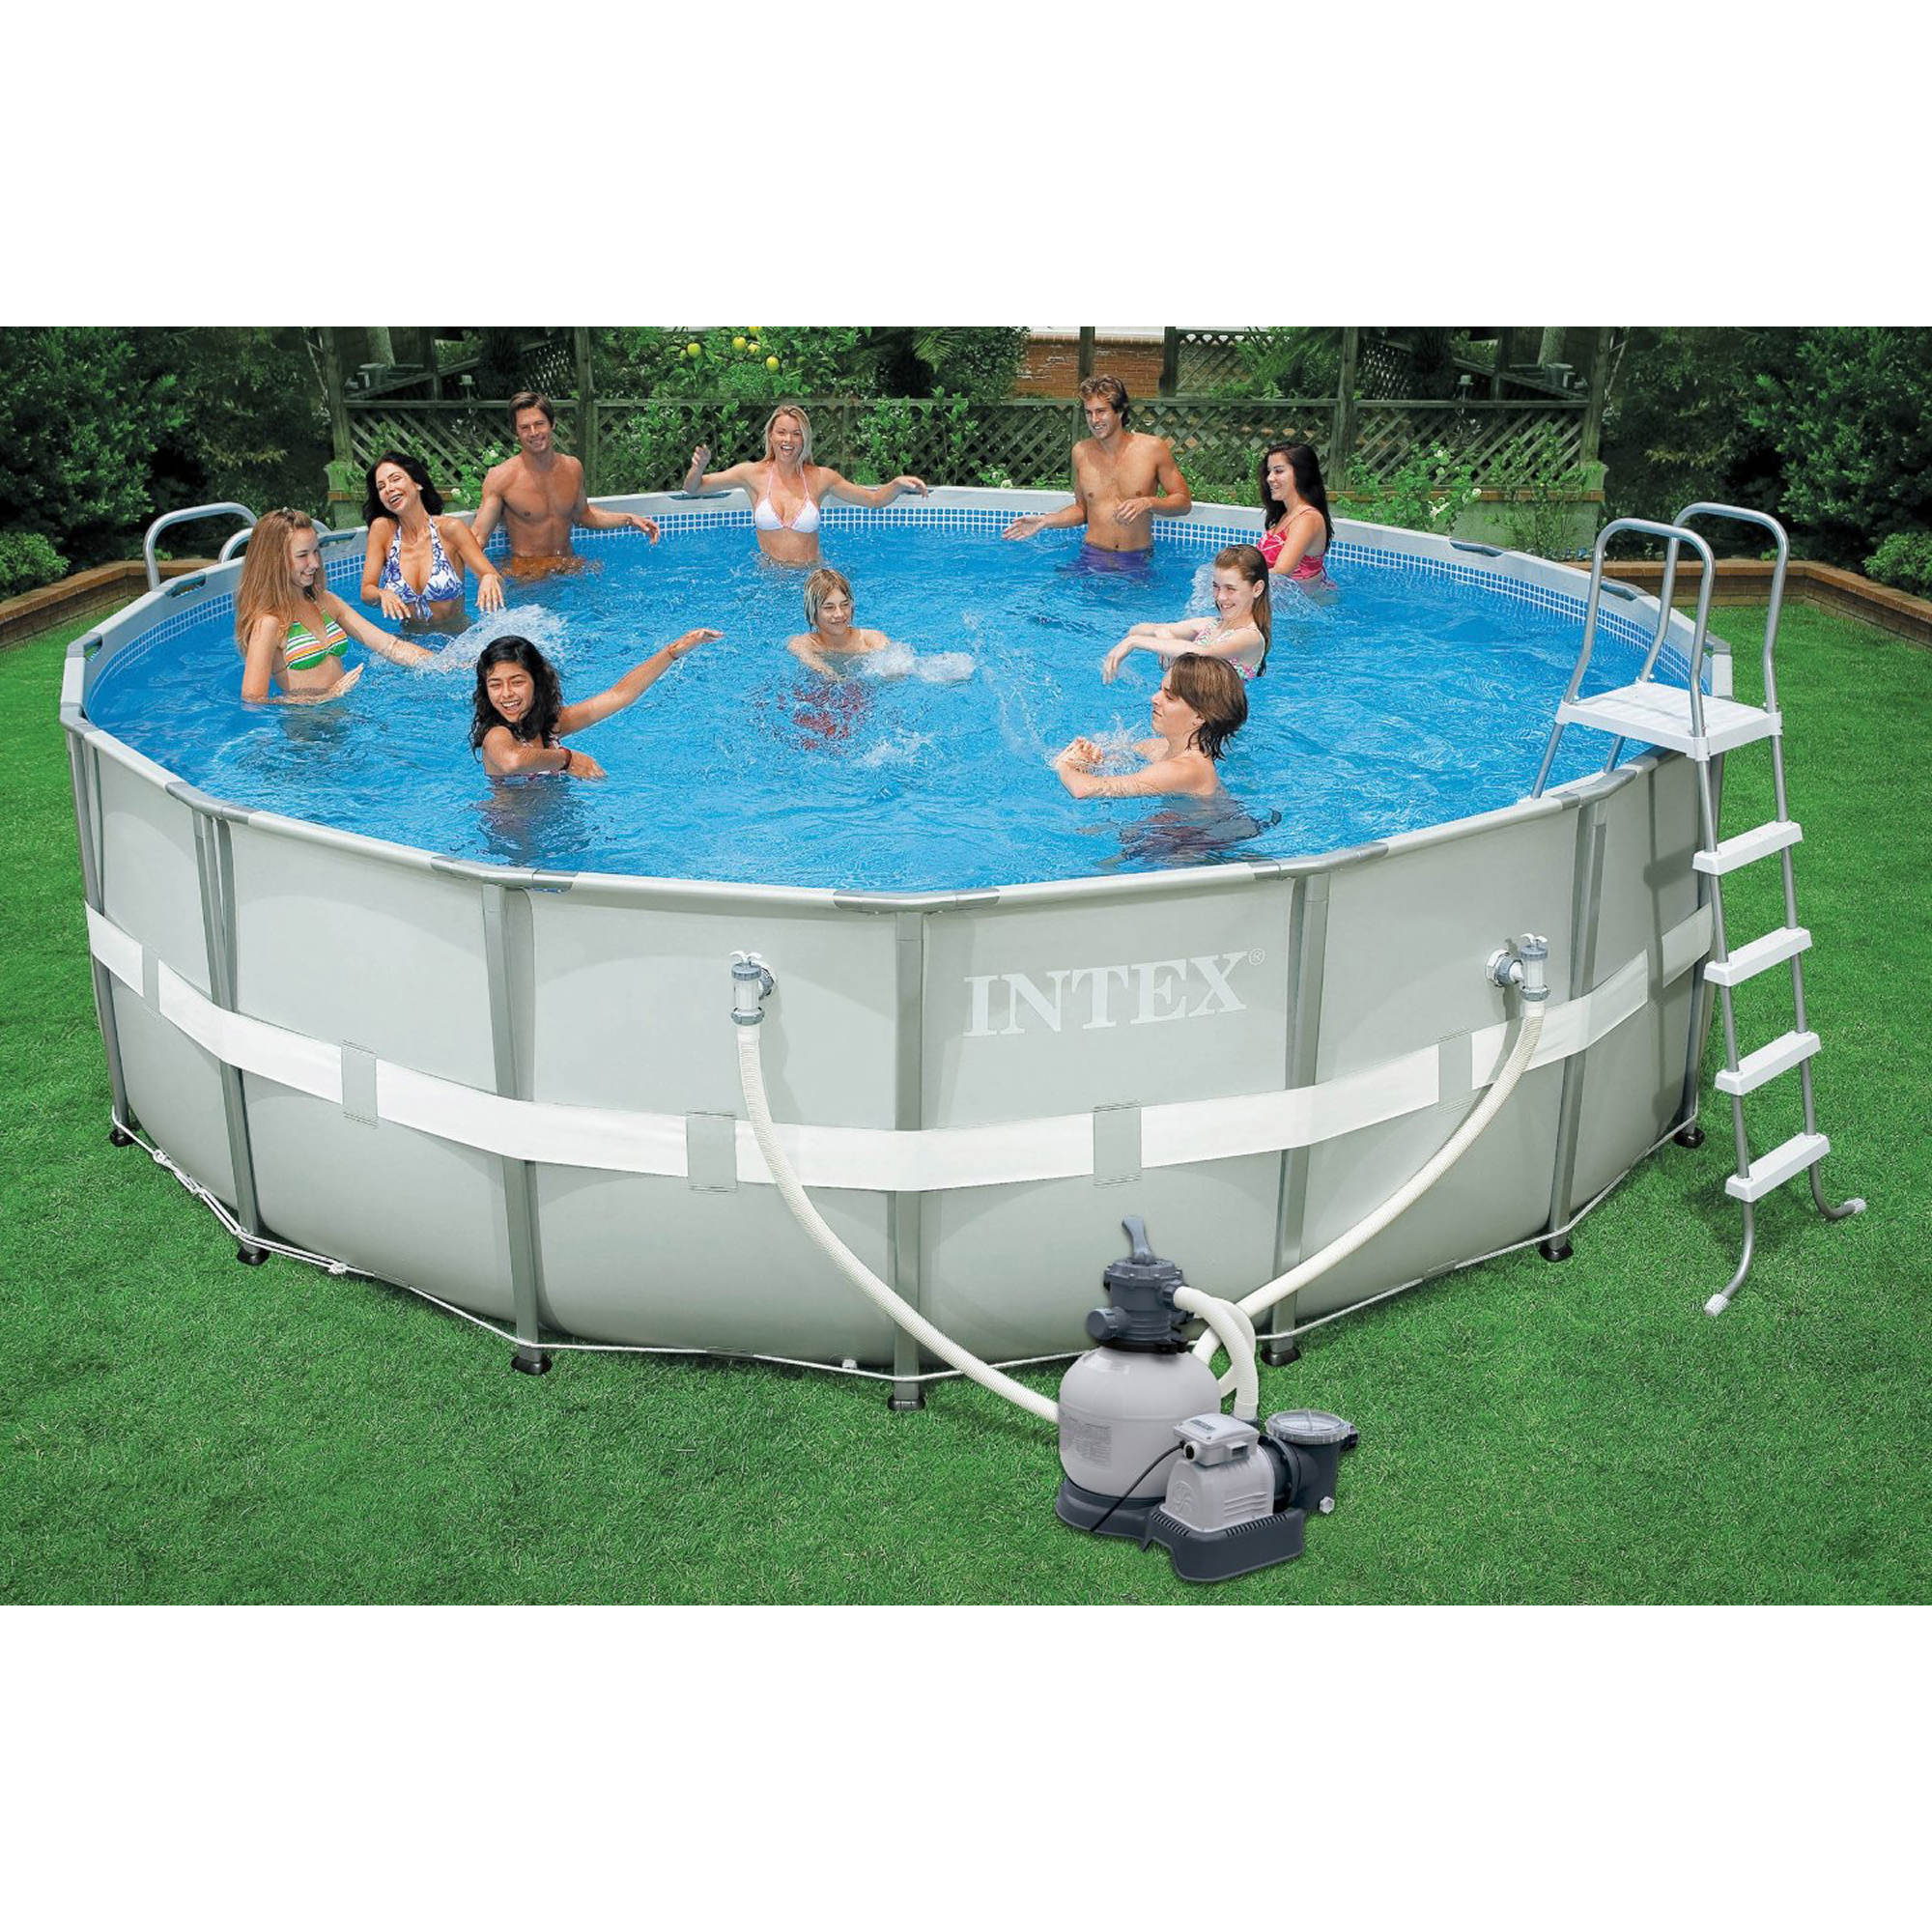 intex 18 39 x 52 round aboveground ultra frame pool bj 39 s wholesale club. Black Bedroom Furniture Sets. Home Design Ideas